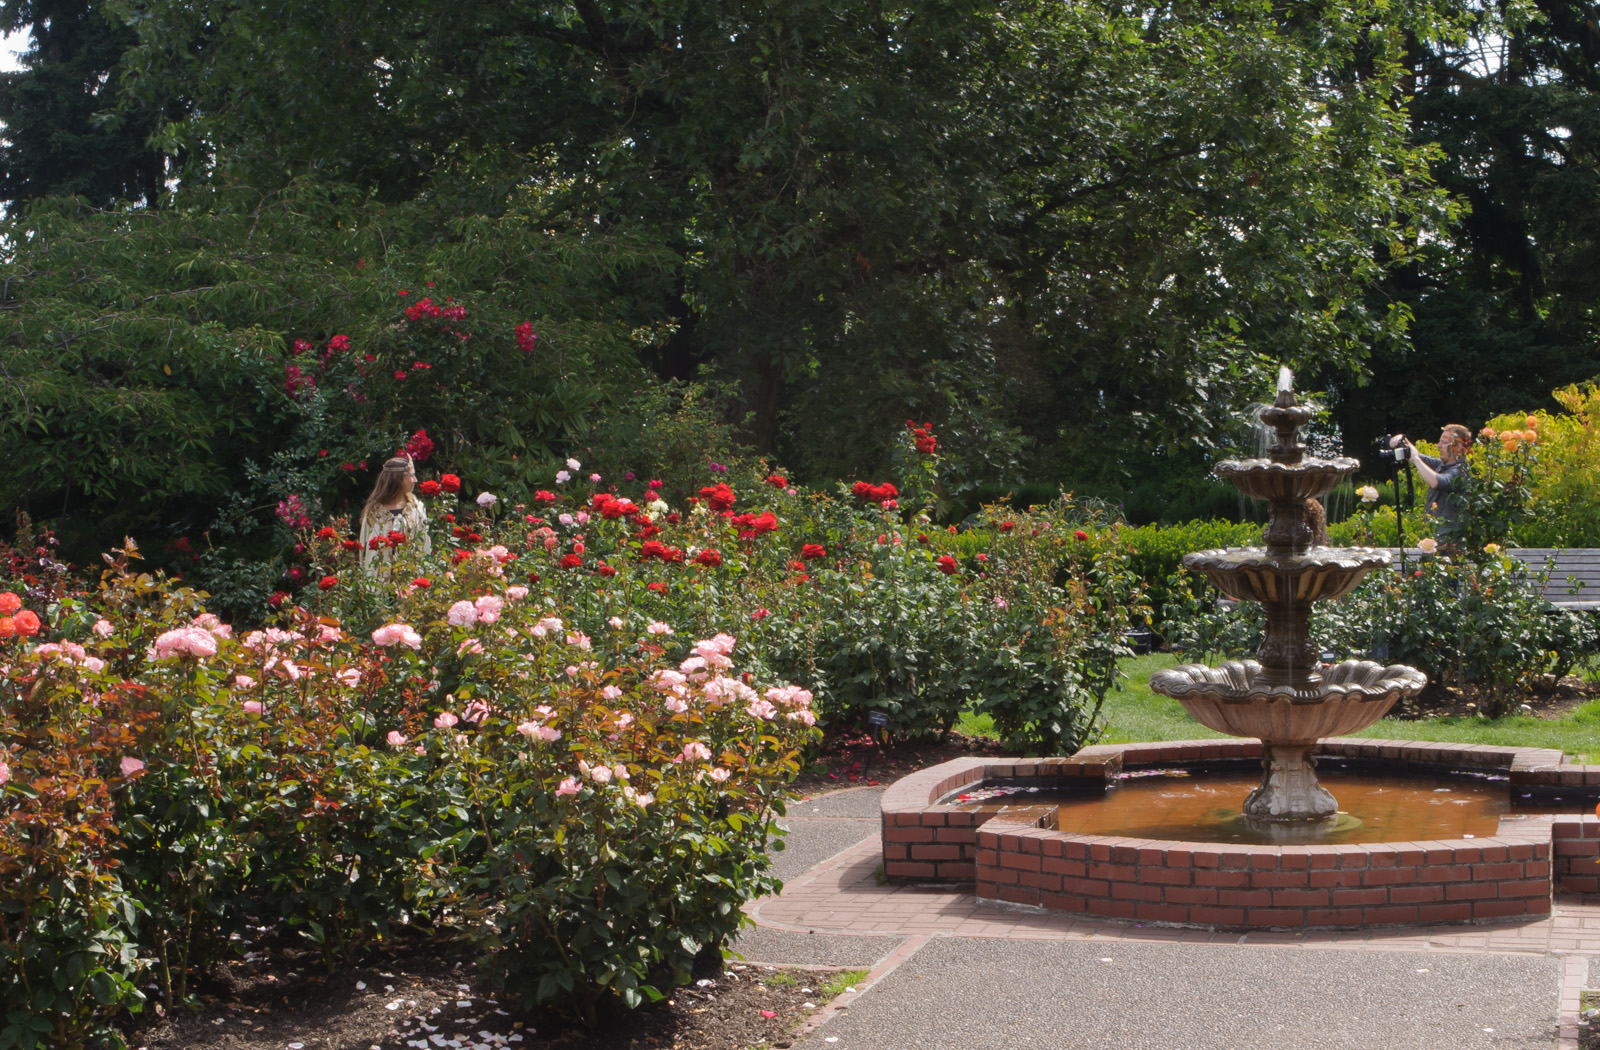 File:International Rose Test Garden, Portland (8076774816).jpg